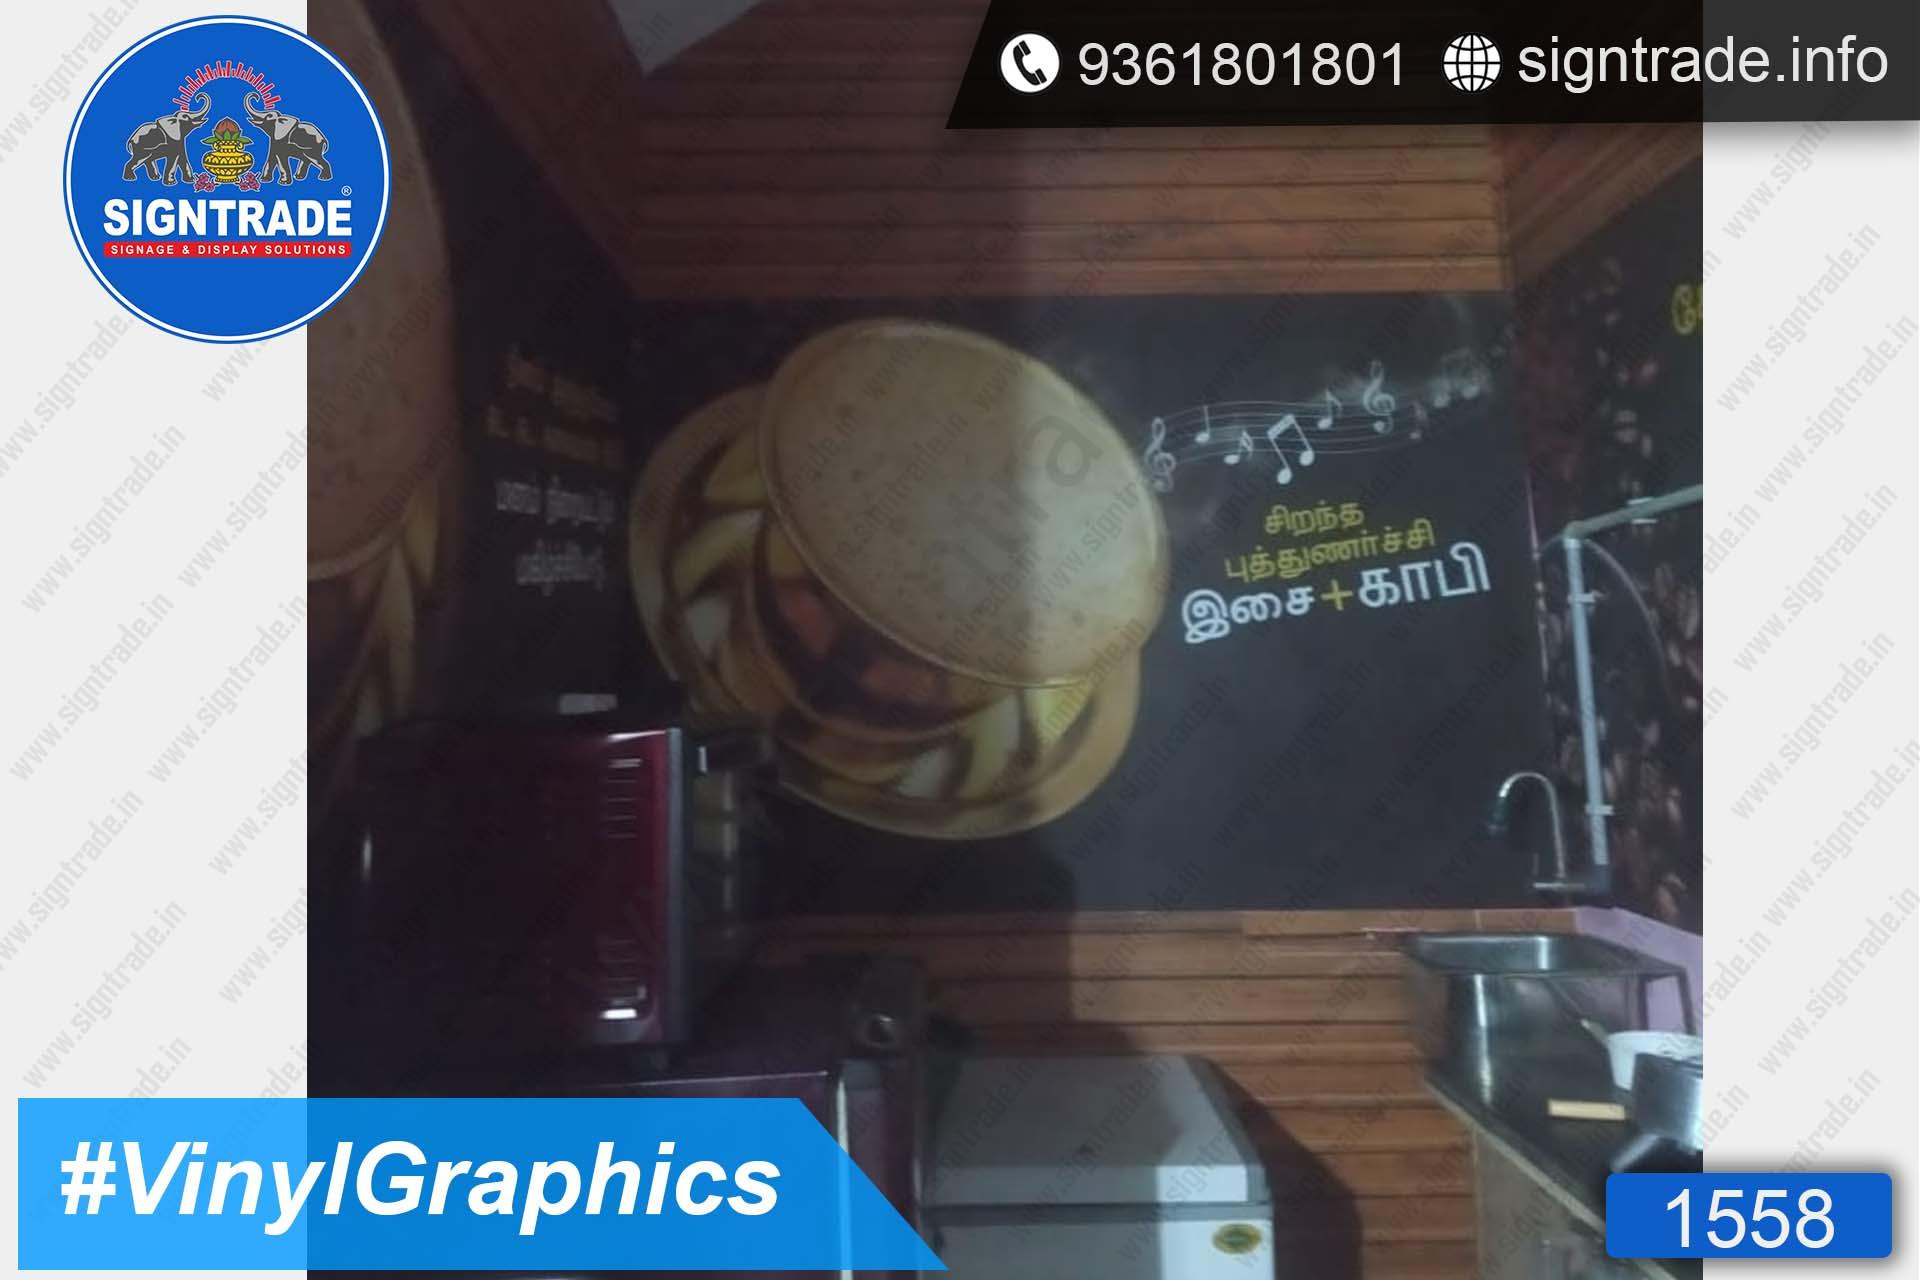 Hot Coffee, Pattabiram, Chennai - SIGNTRADE - Wall Graphics, Vinyl Graphics, Vinyl Printing Service in Chennai